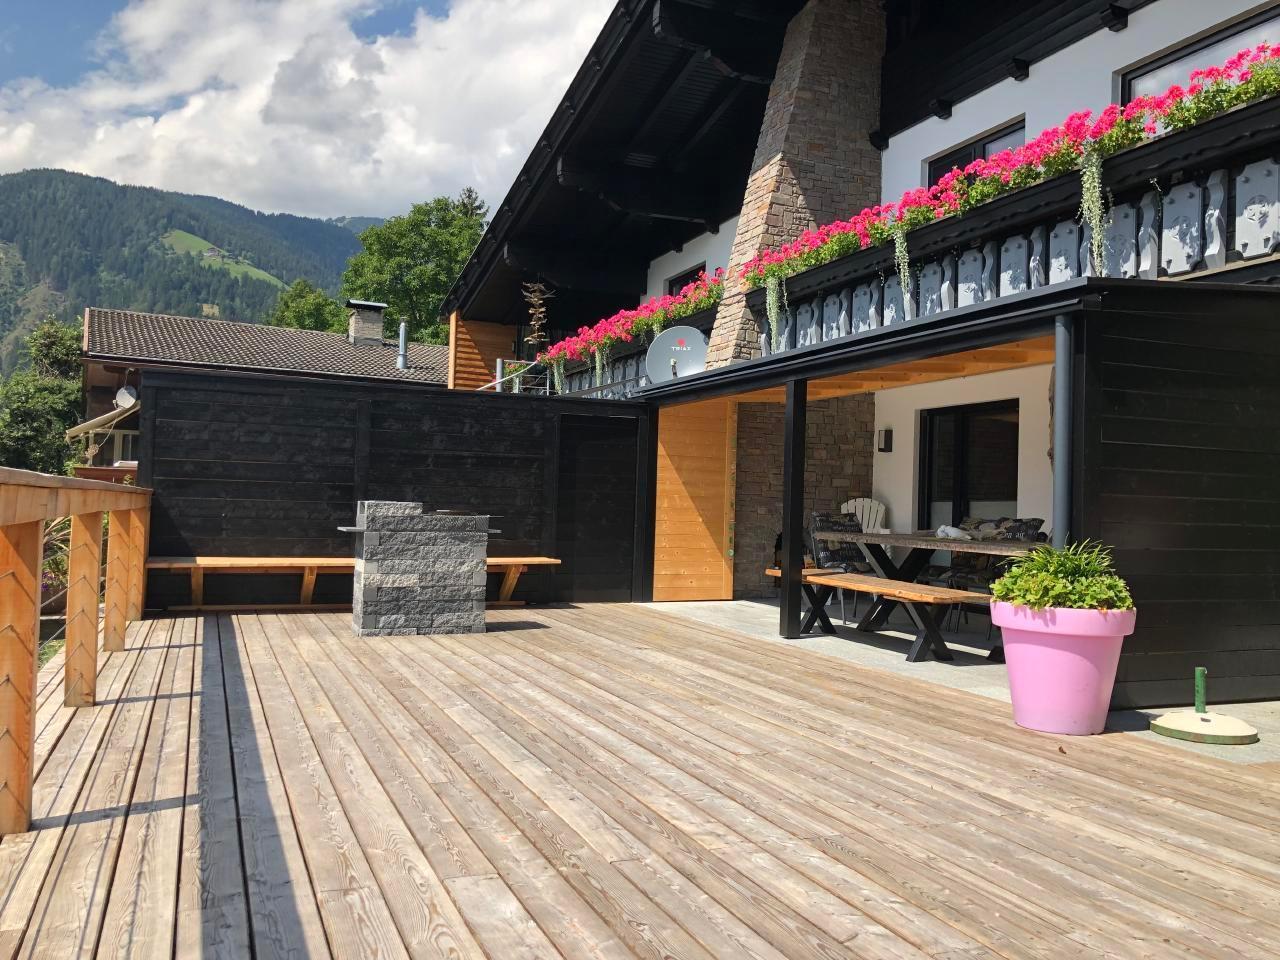 Maison de vacances Landhaus Osttirol (2299545), Dölsach, Osttirol, Tyrol, Autriche, image 37